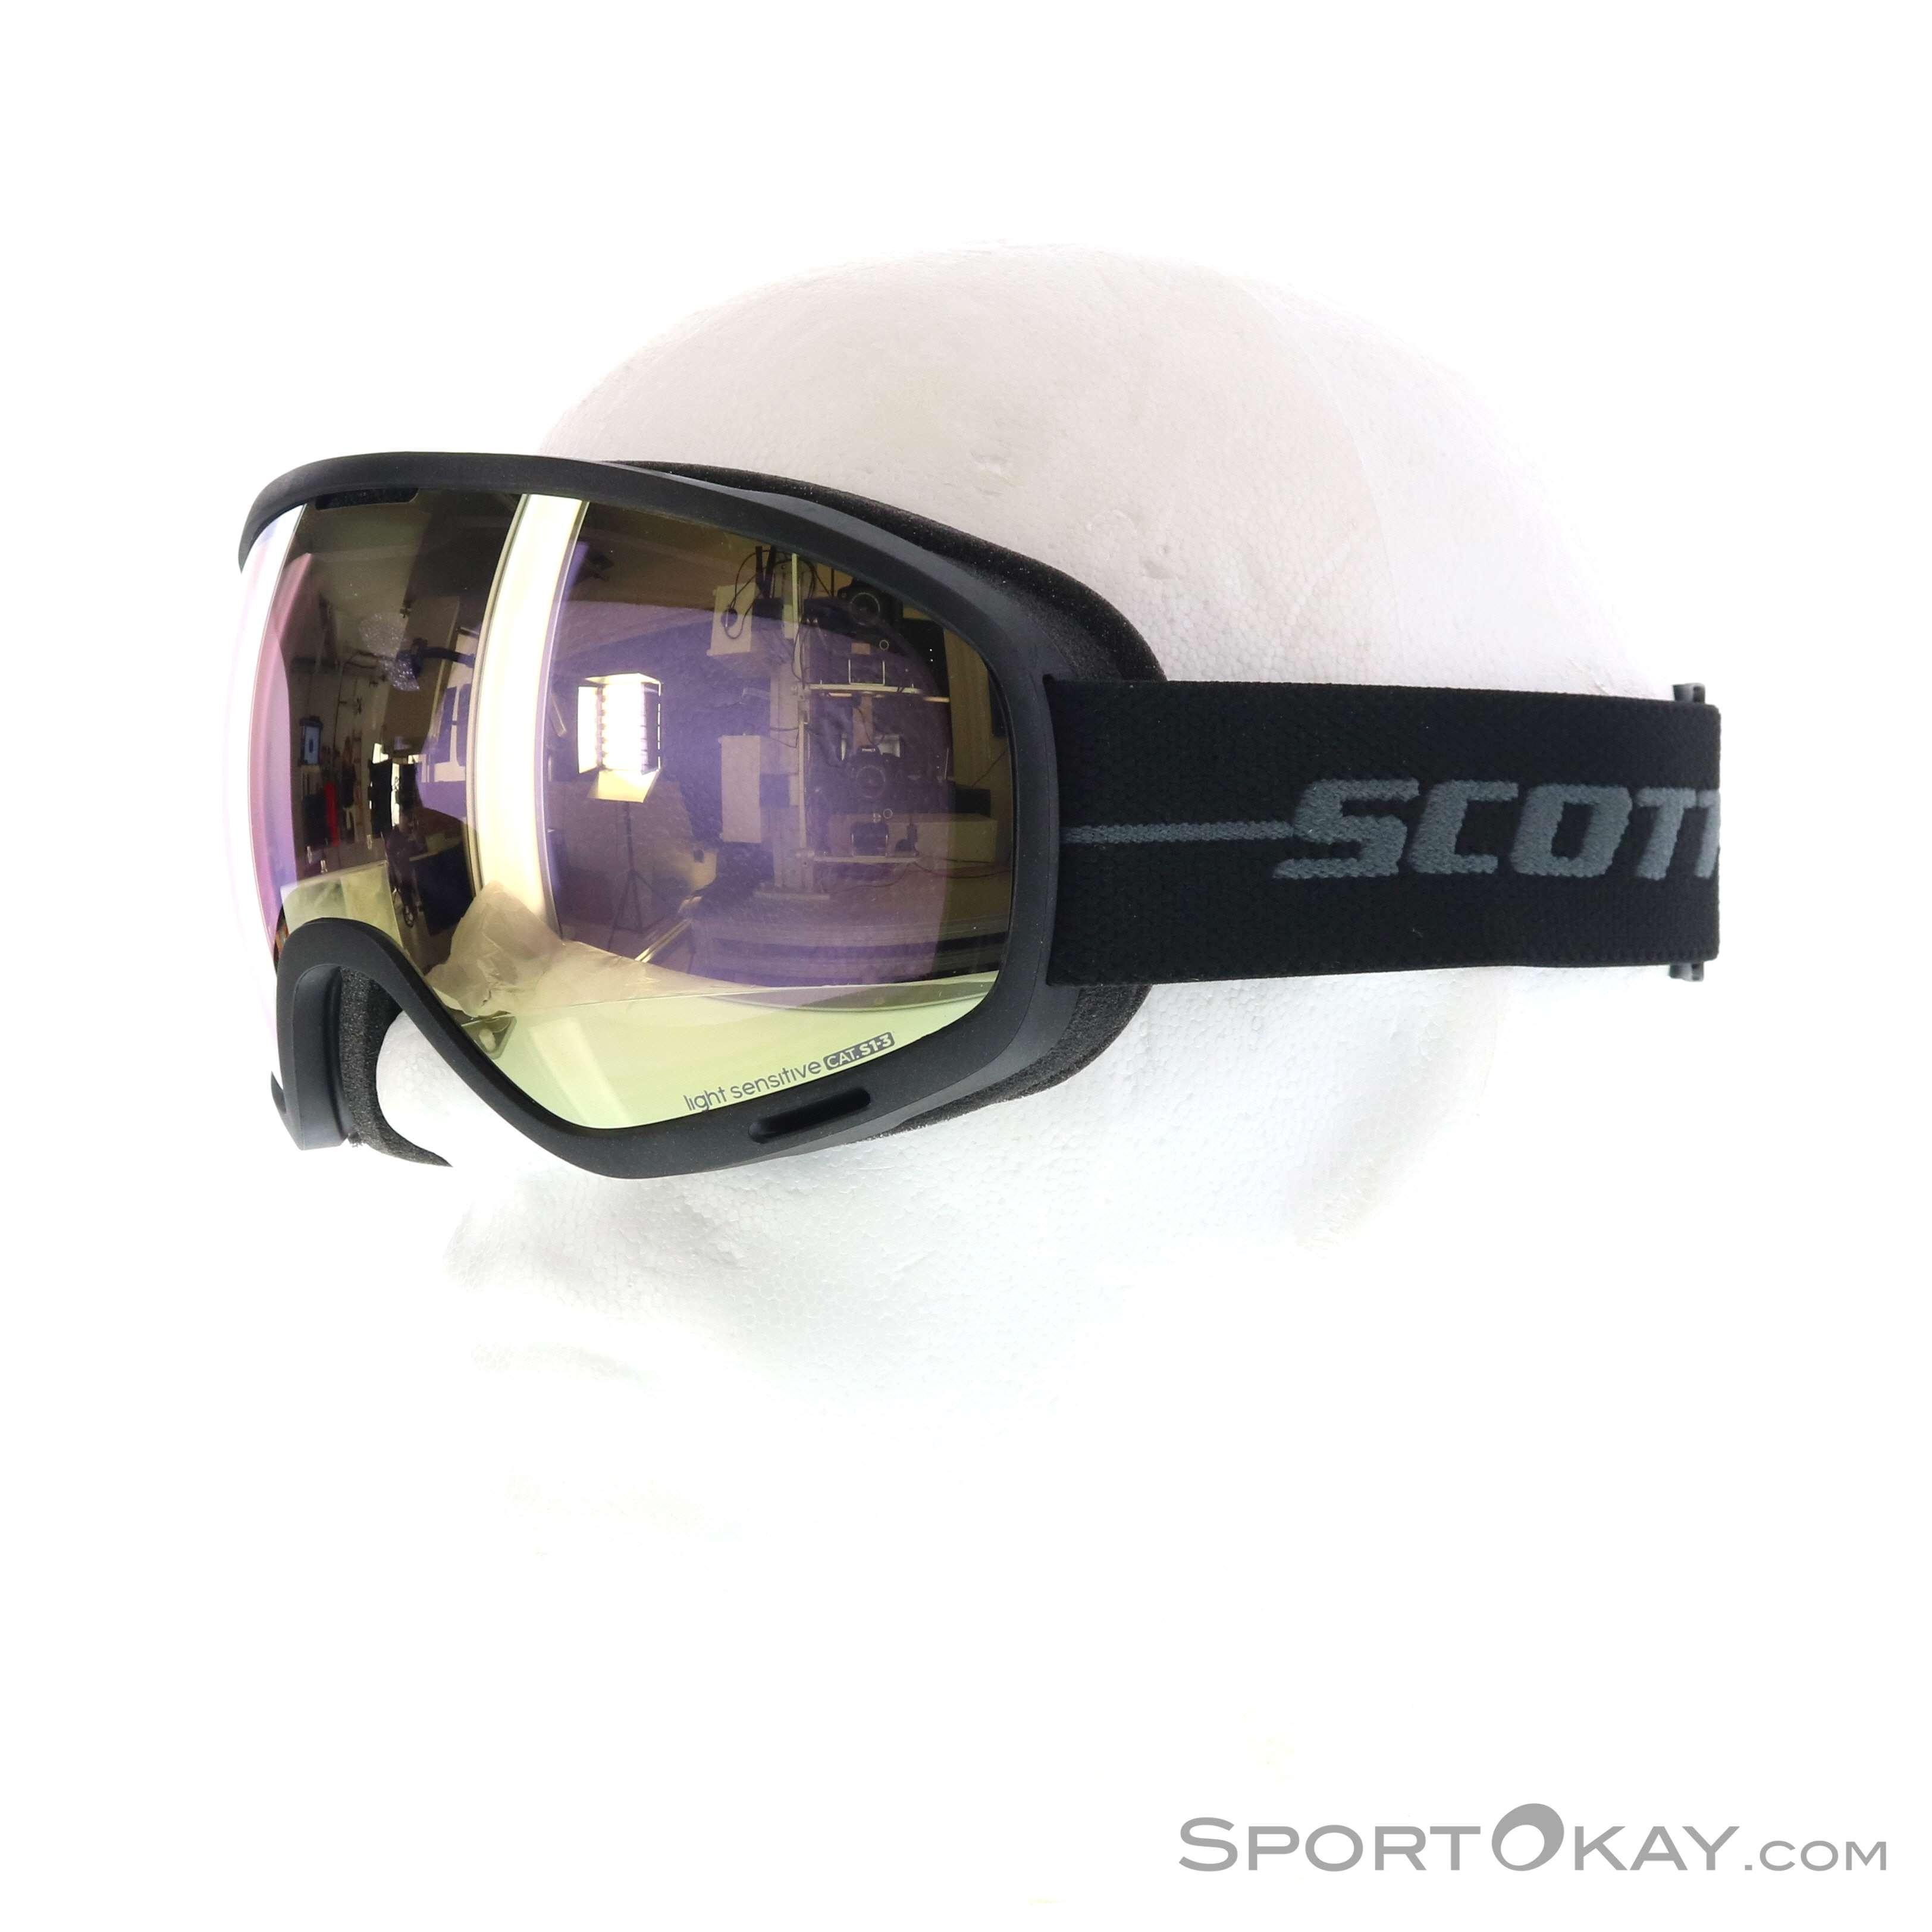 23fe43c75b8 Scott unlimited ii otg light sensitive ski goggle scott black male jpg  3248x3248 Ski goggles with